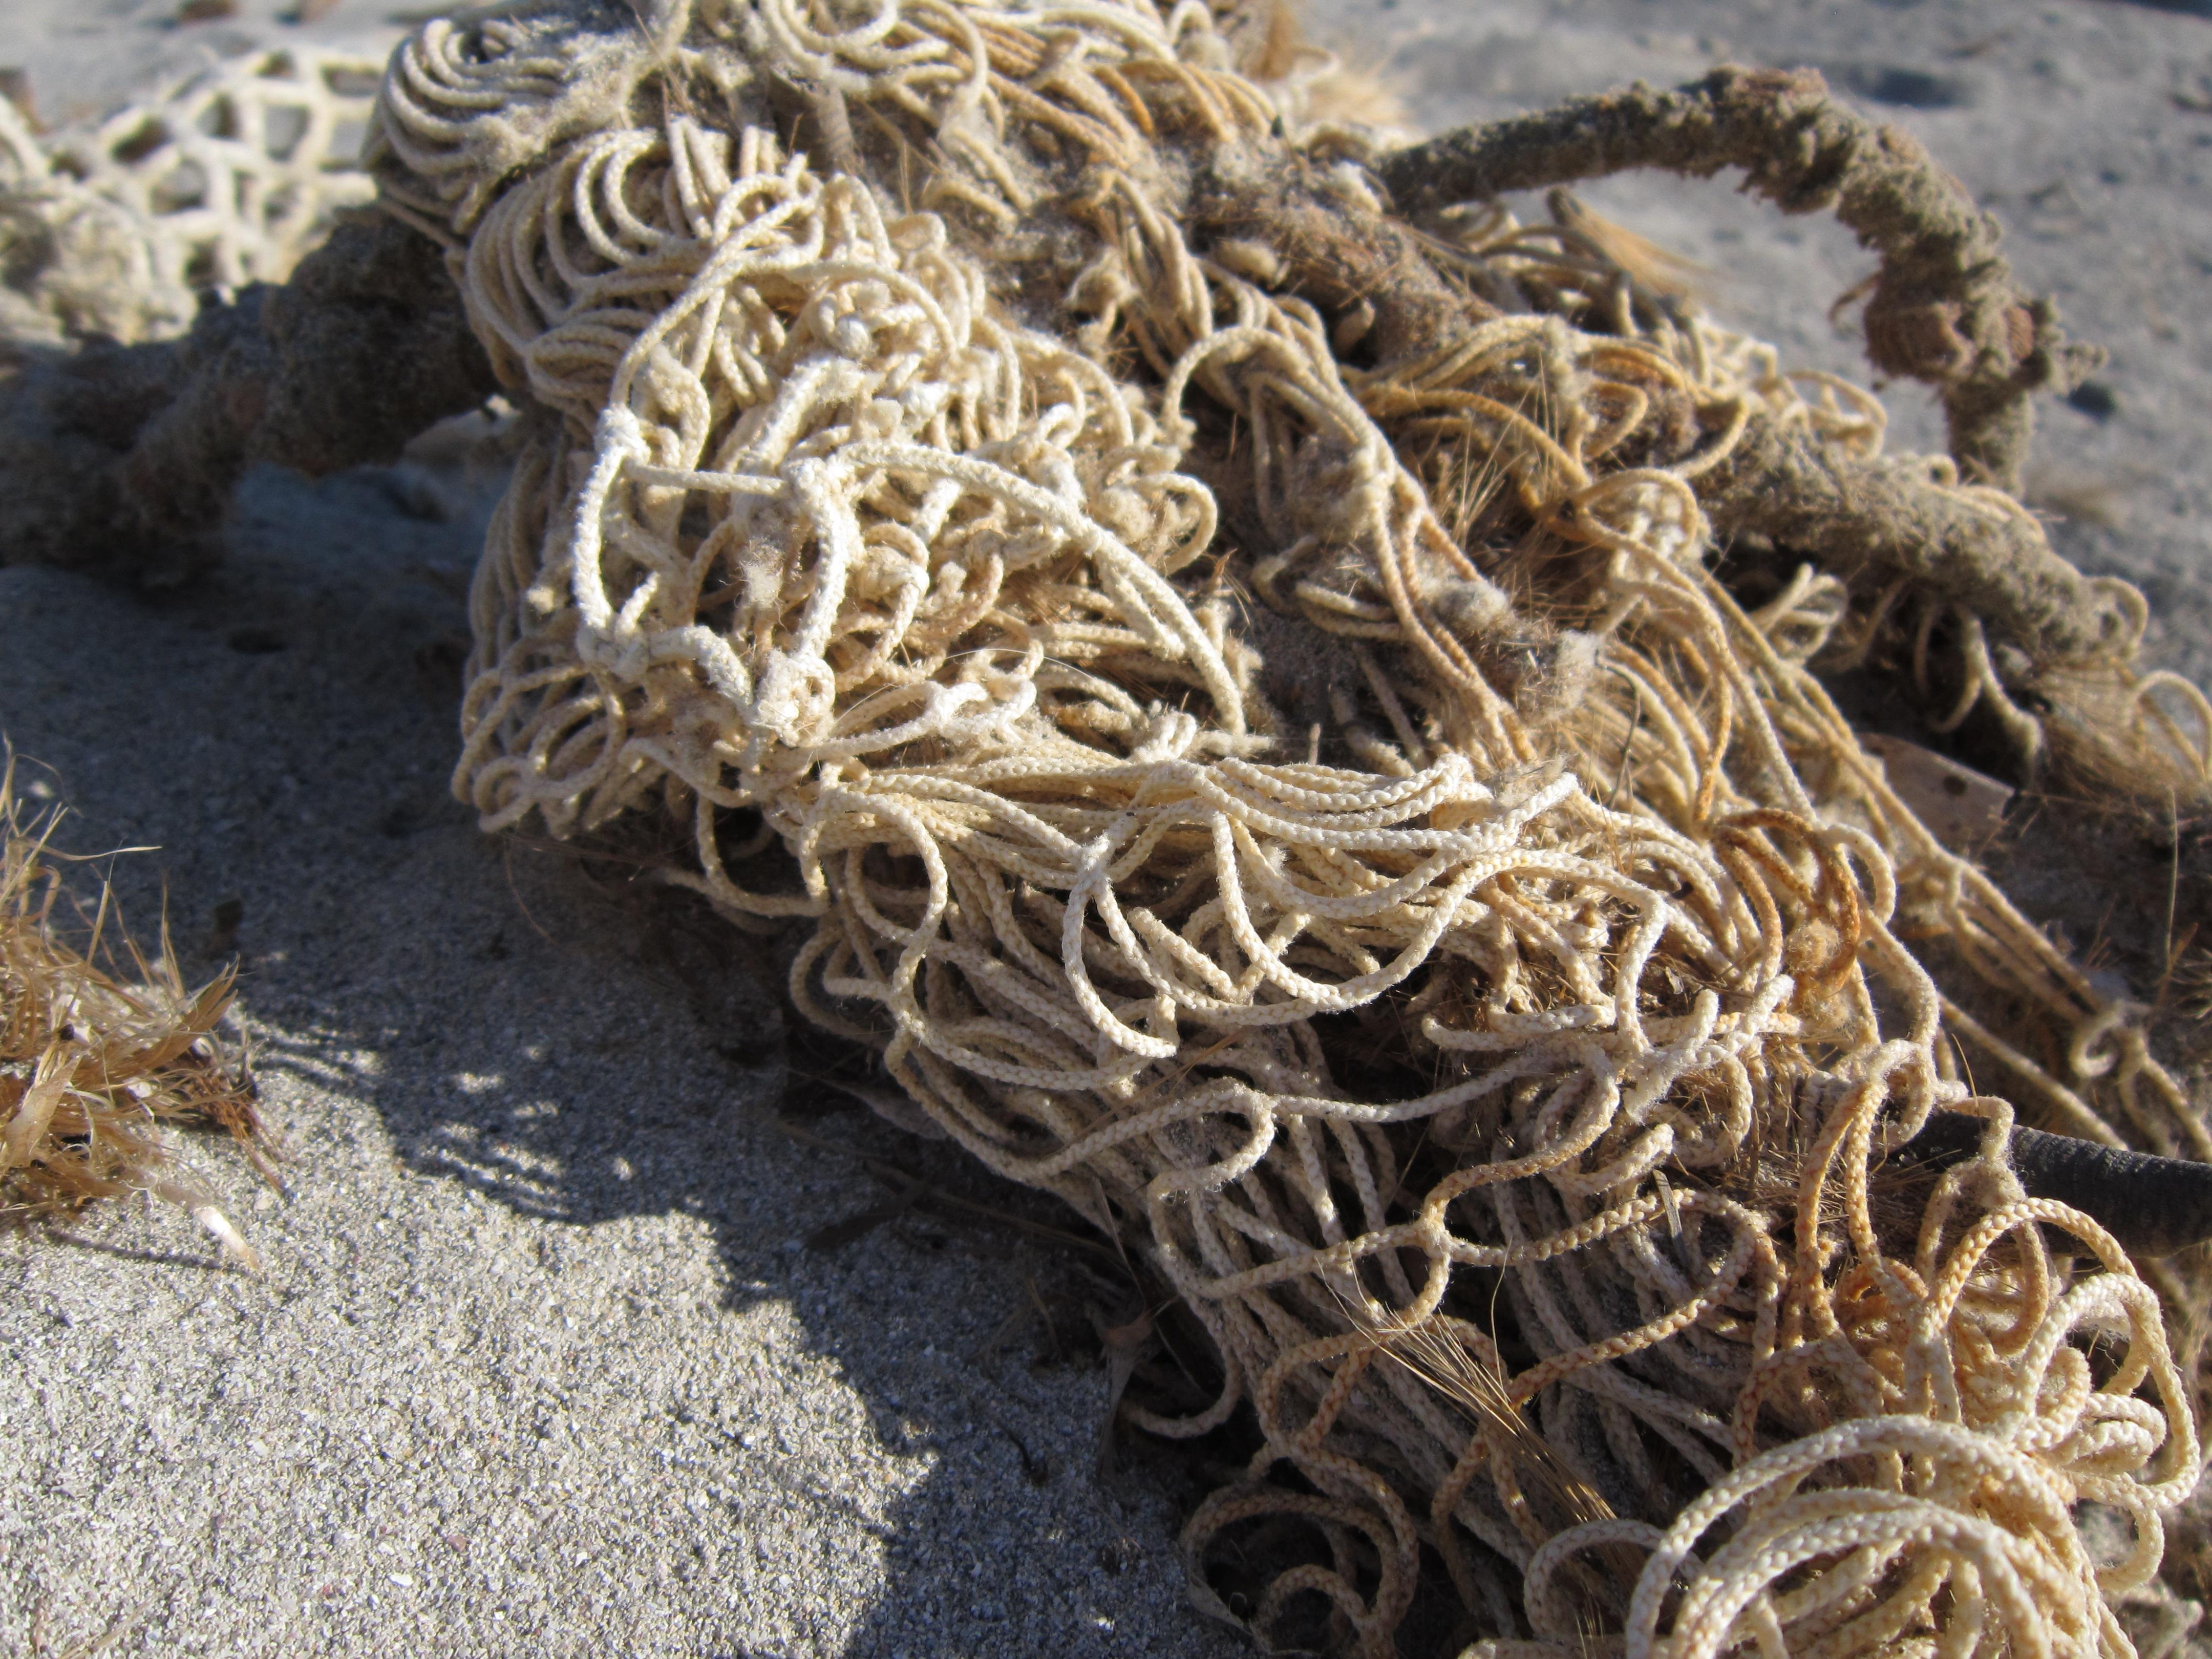 Gambar Pantai Pasir Rumput Laut Dekat Akar Kalah